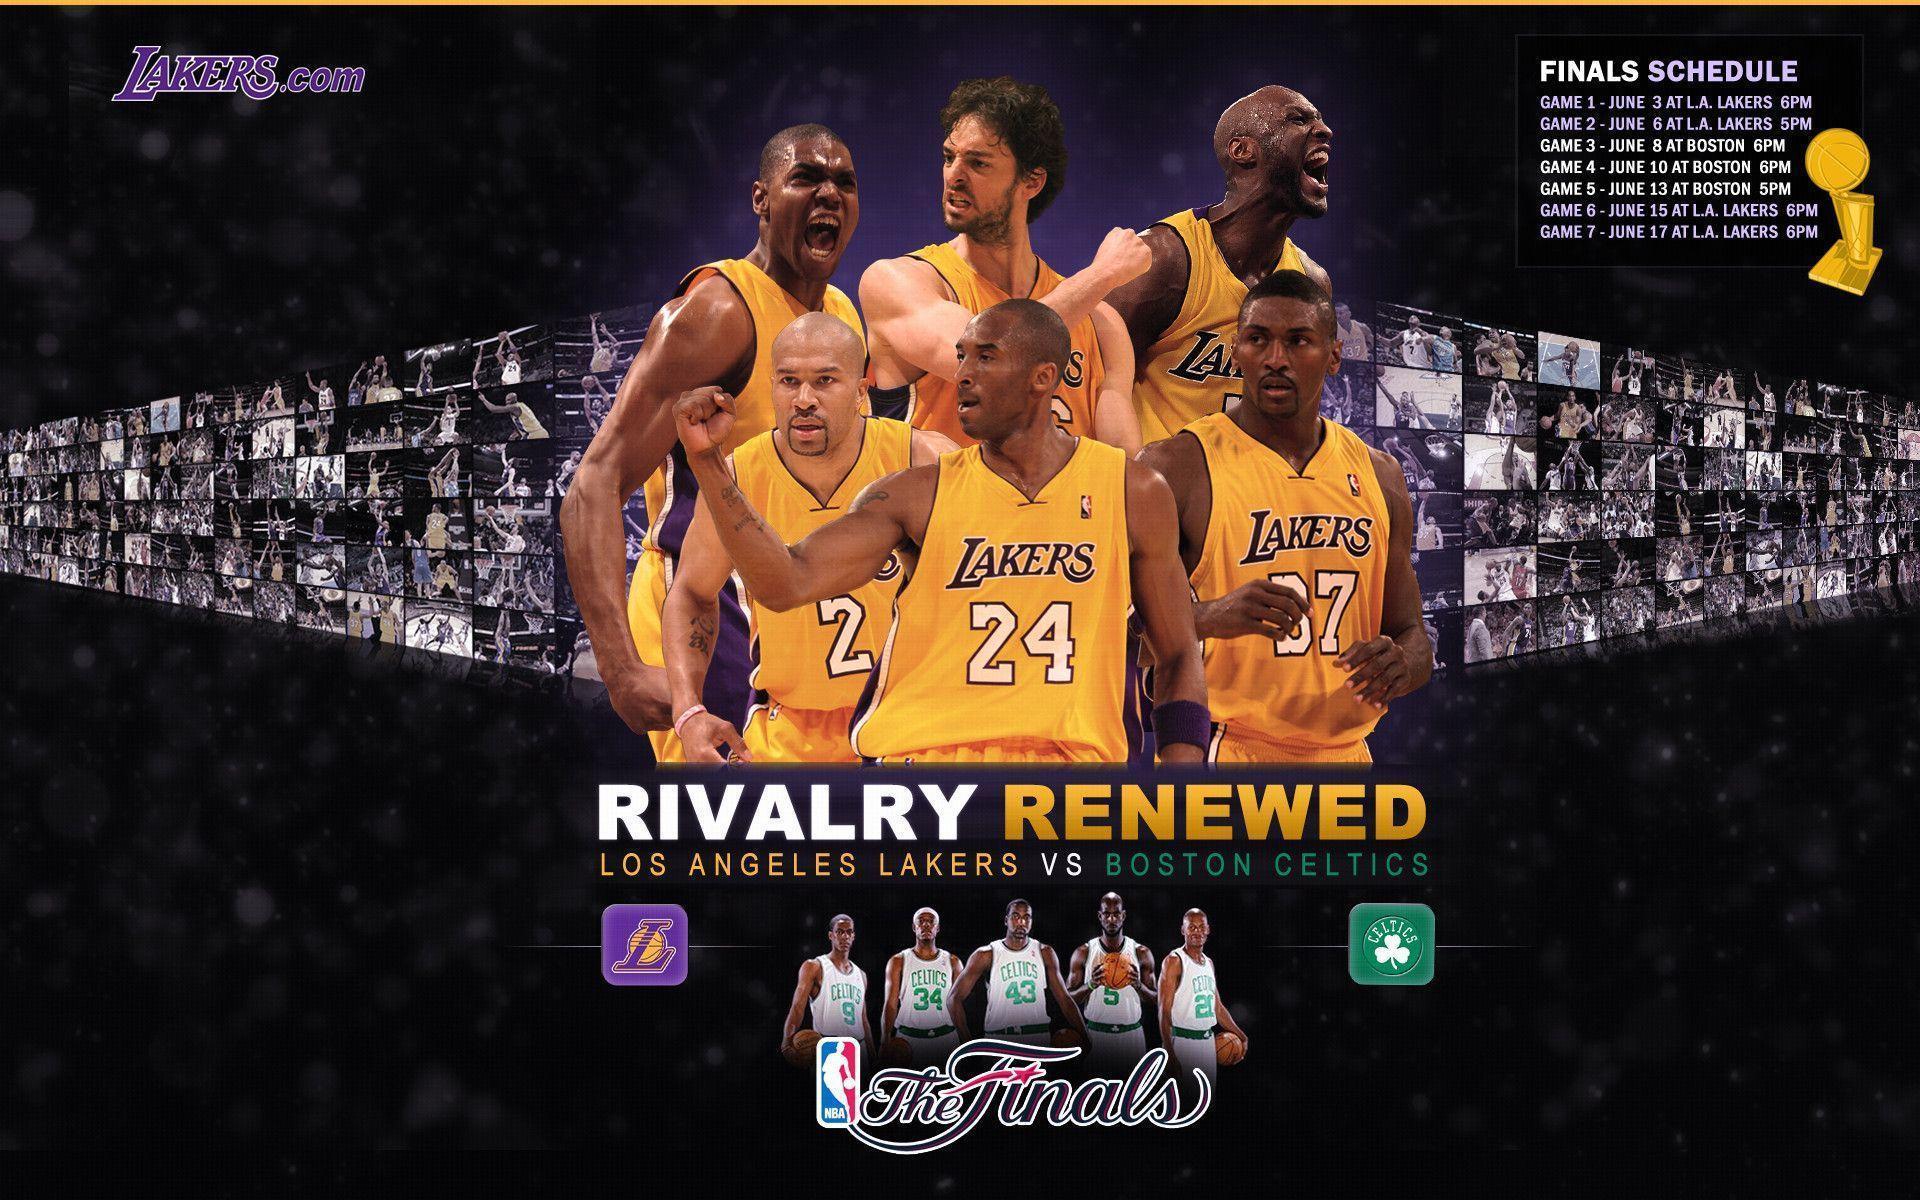 Los Angeles Lakers Wallpaper Hd Wallpapers Lakers Wallpaper Cave